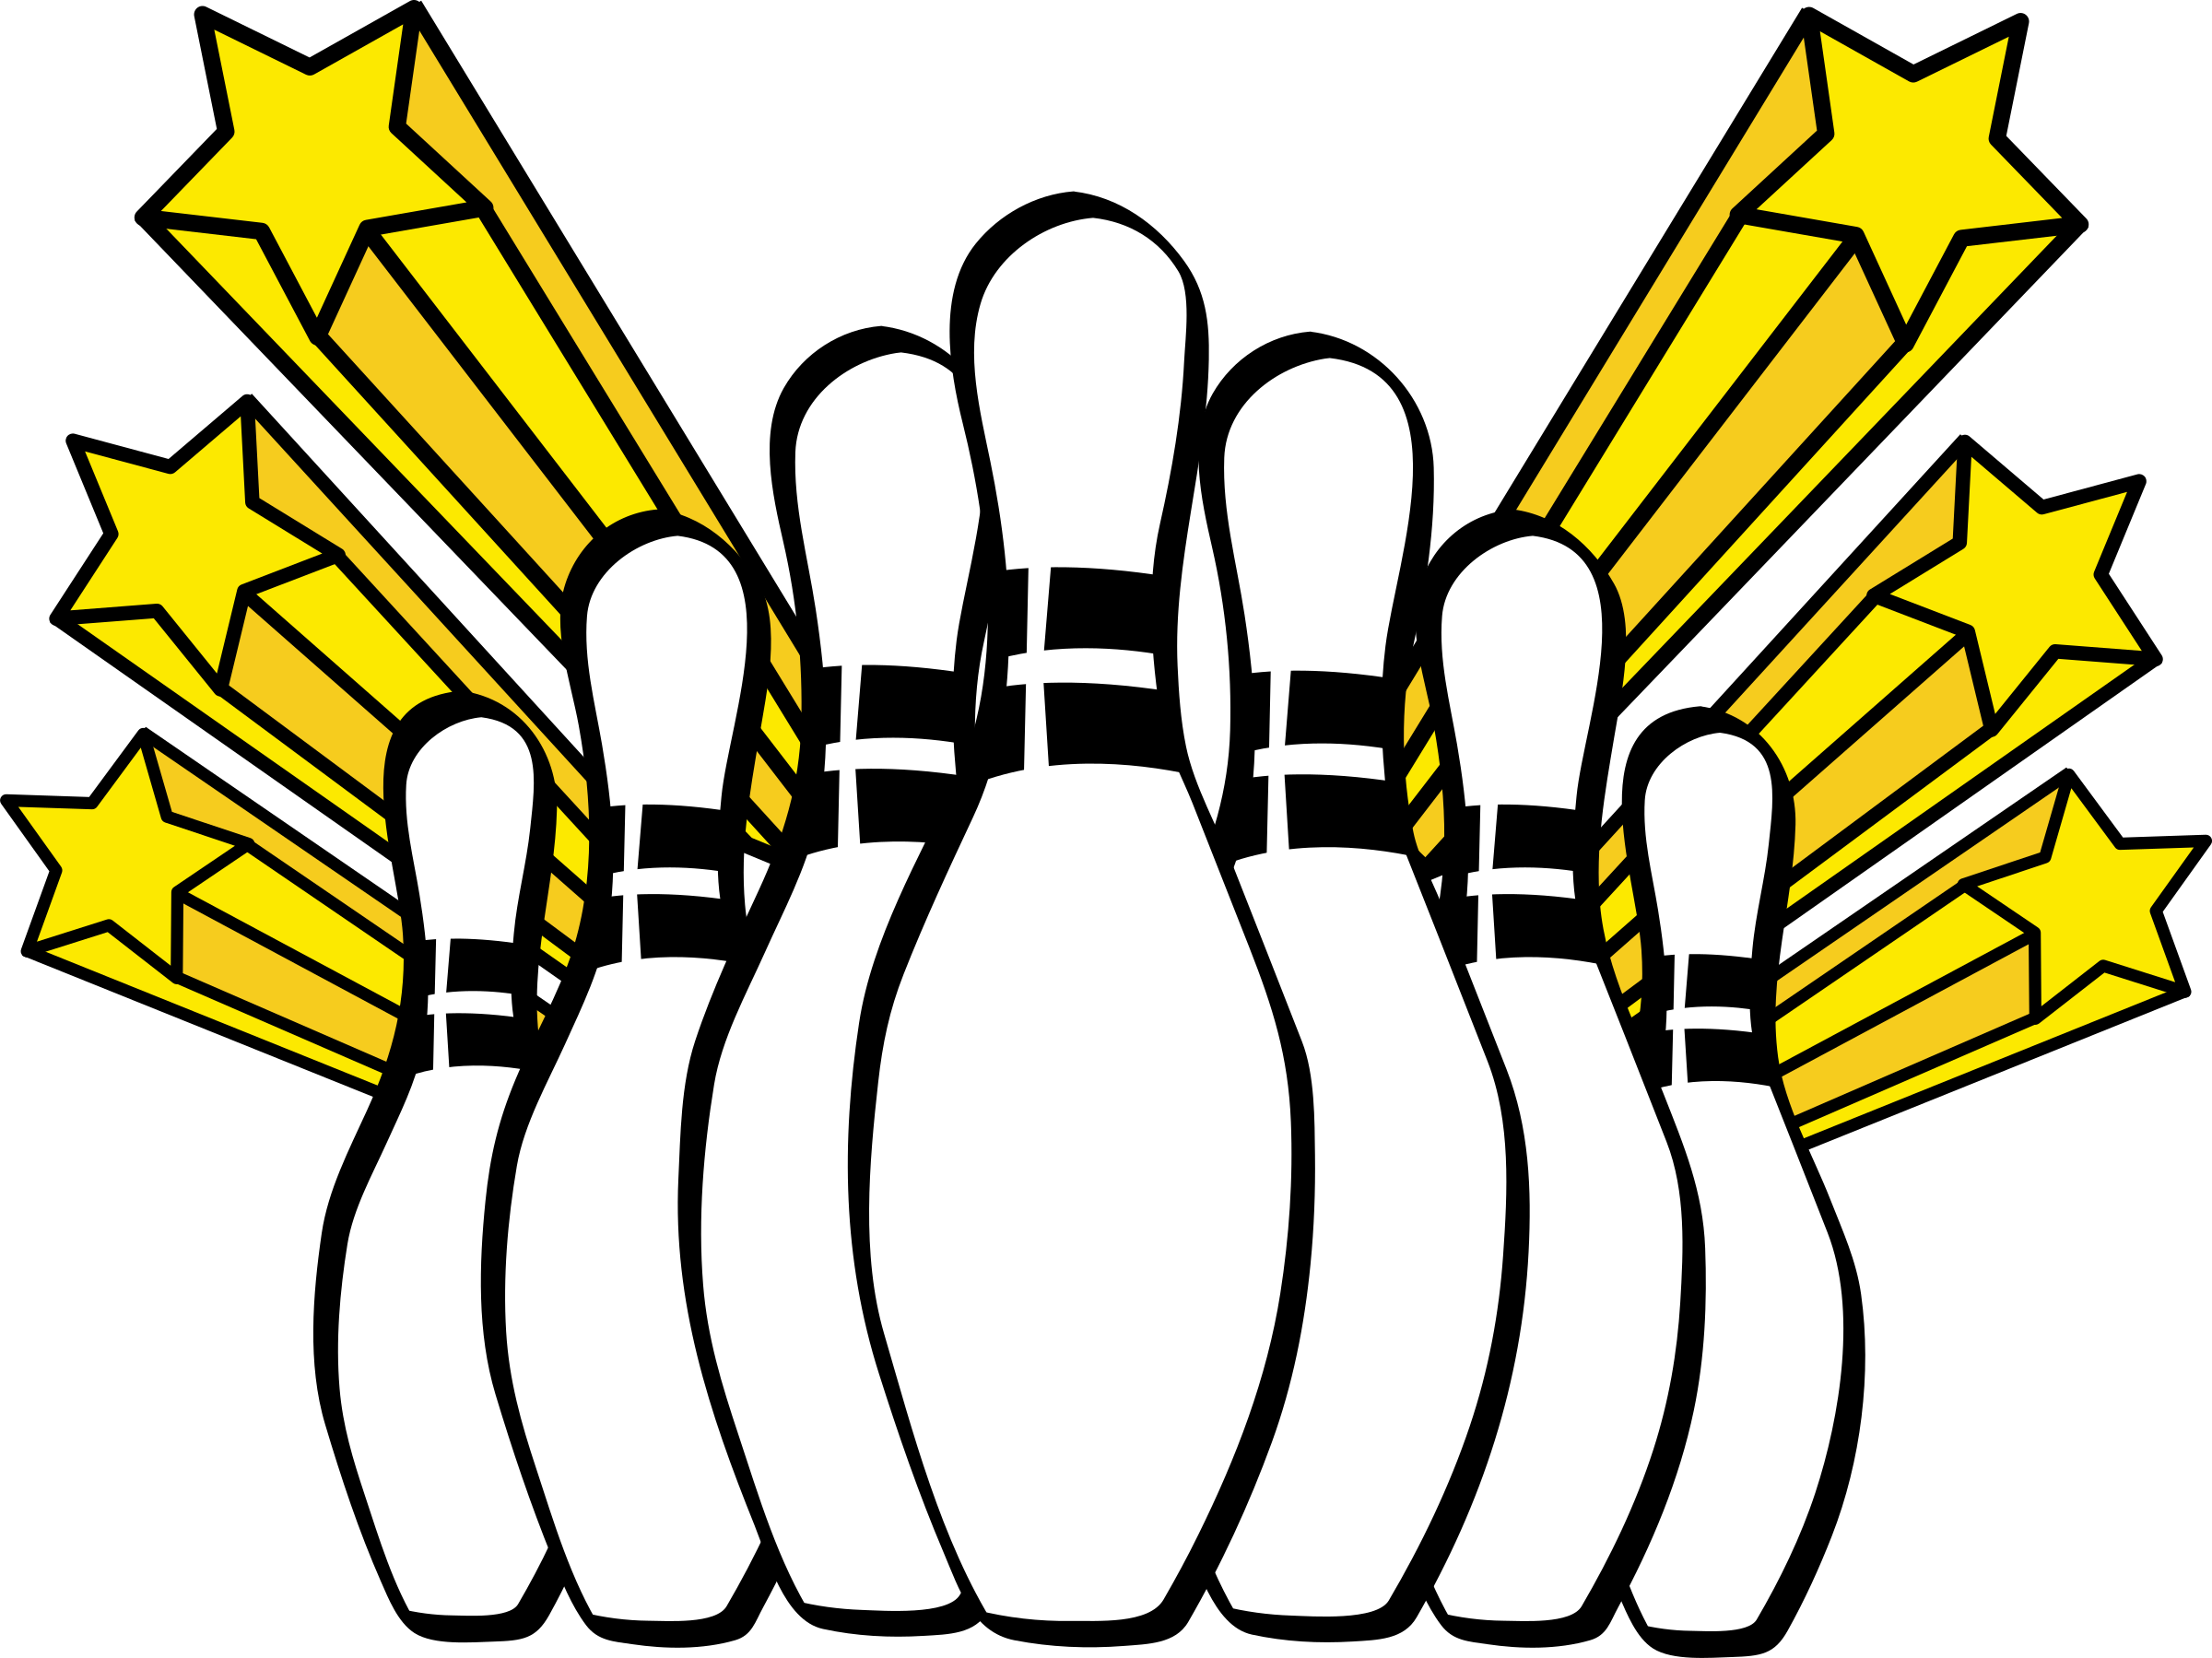 clip art download Pins clipart. Fresh decoration bowling pin.